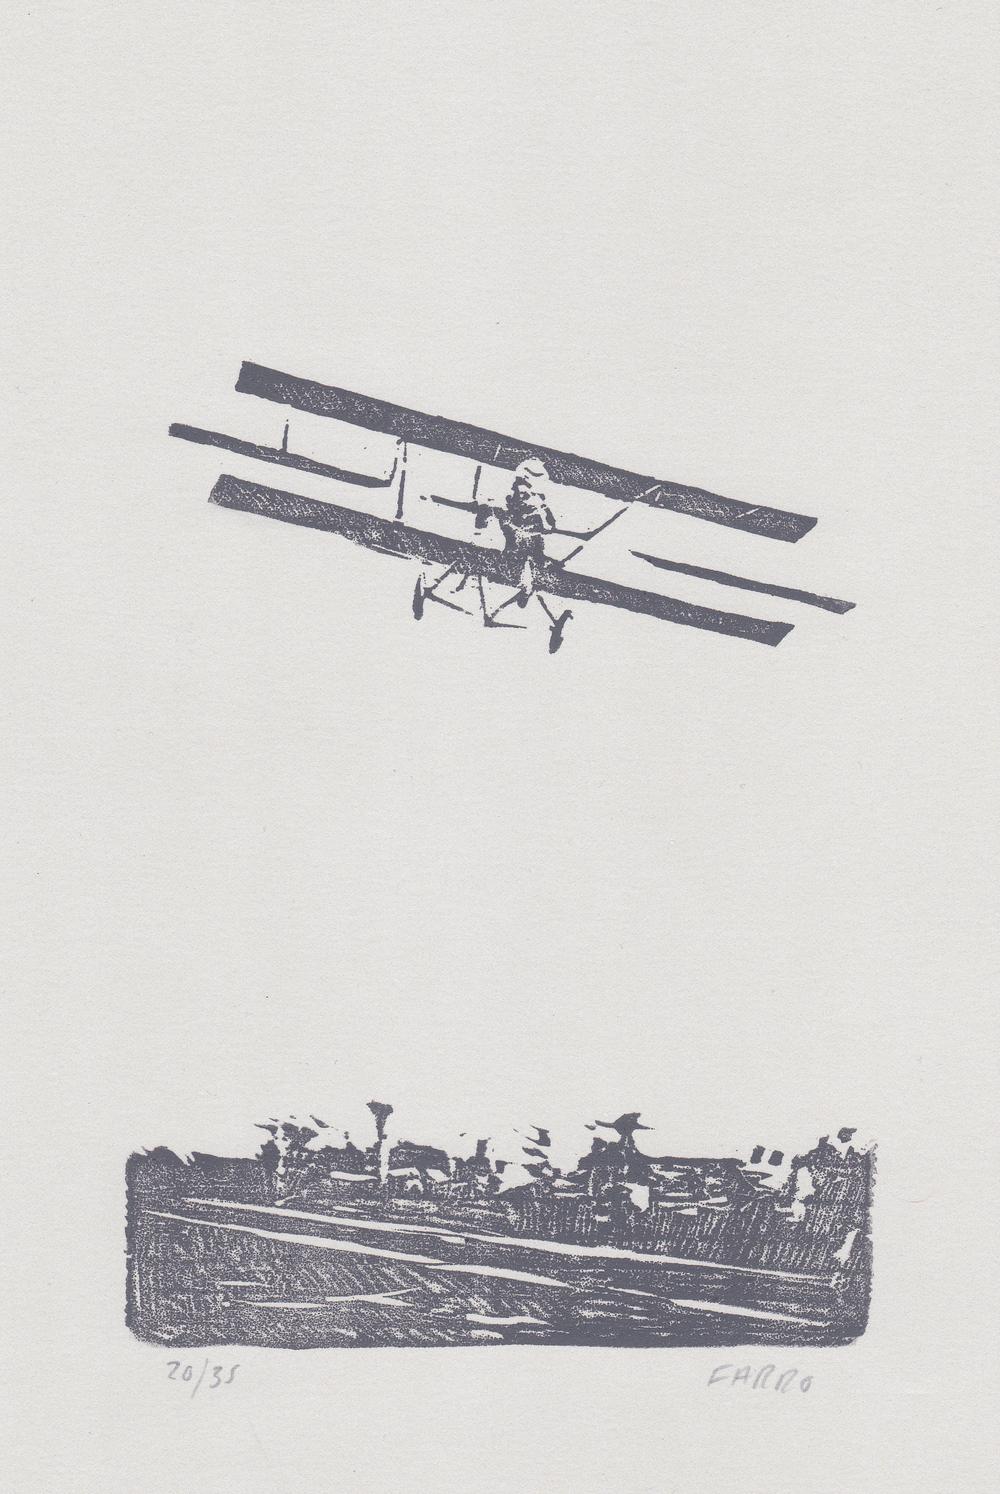 "Lincoln Beachey   woodblock print  edition of 35  4.5x6""  2013"